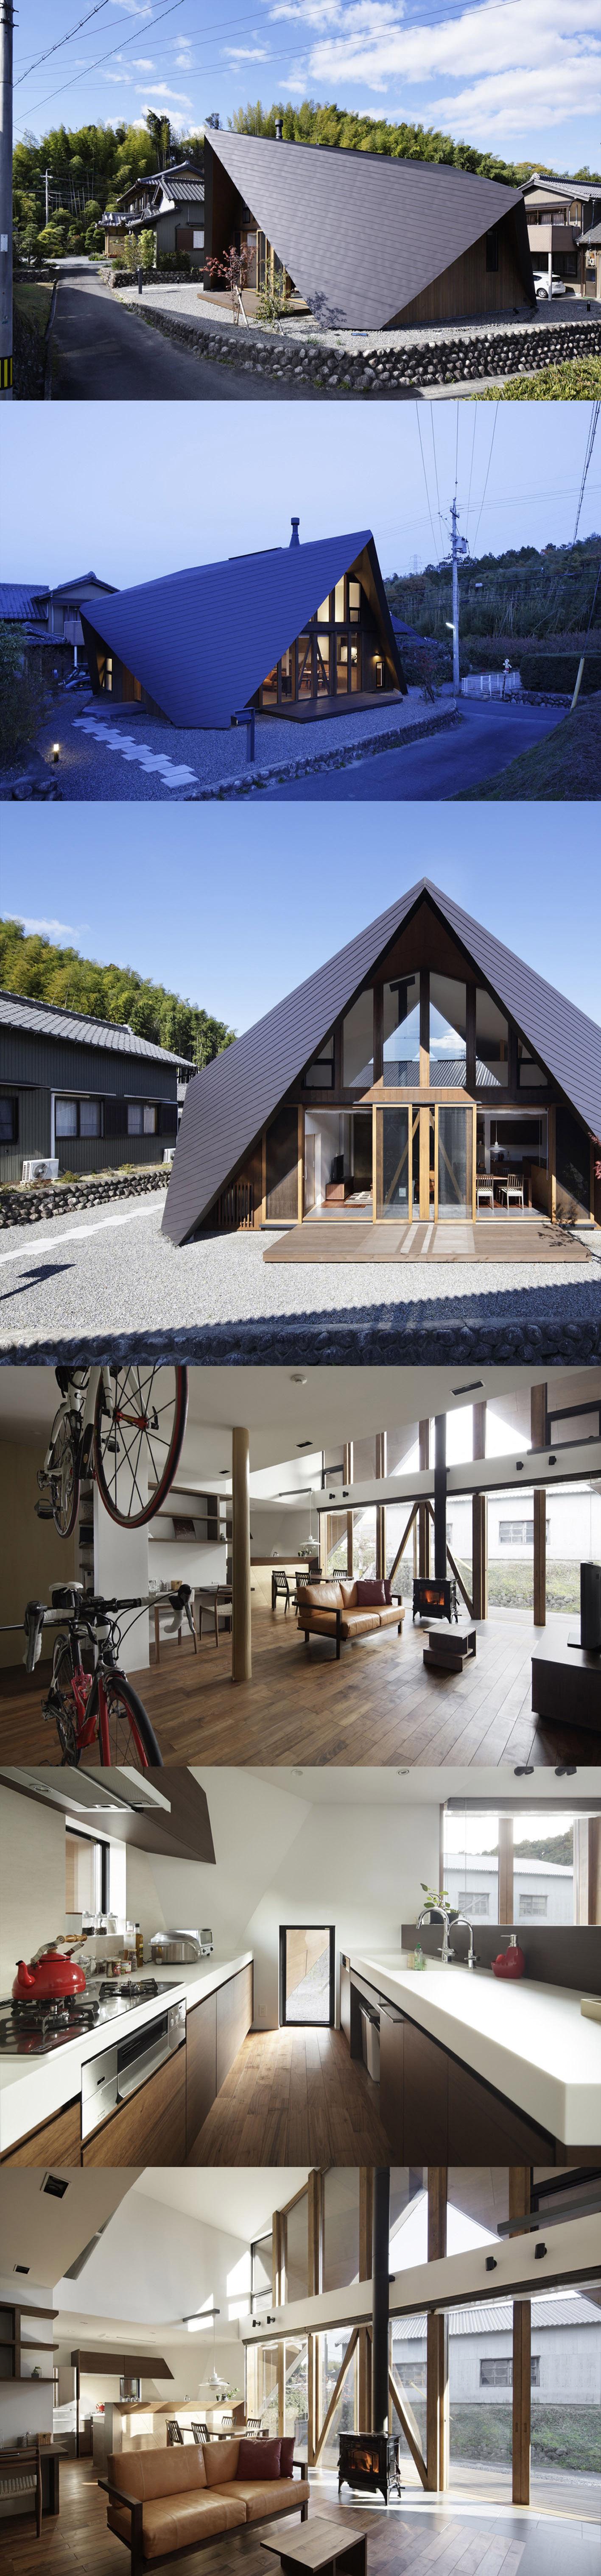 Origami House by architect Yoshiaki Tanaka of TSC Architects in Mie, Japan